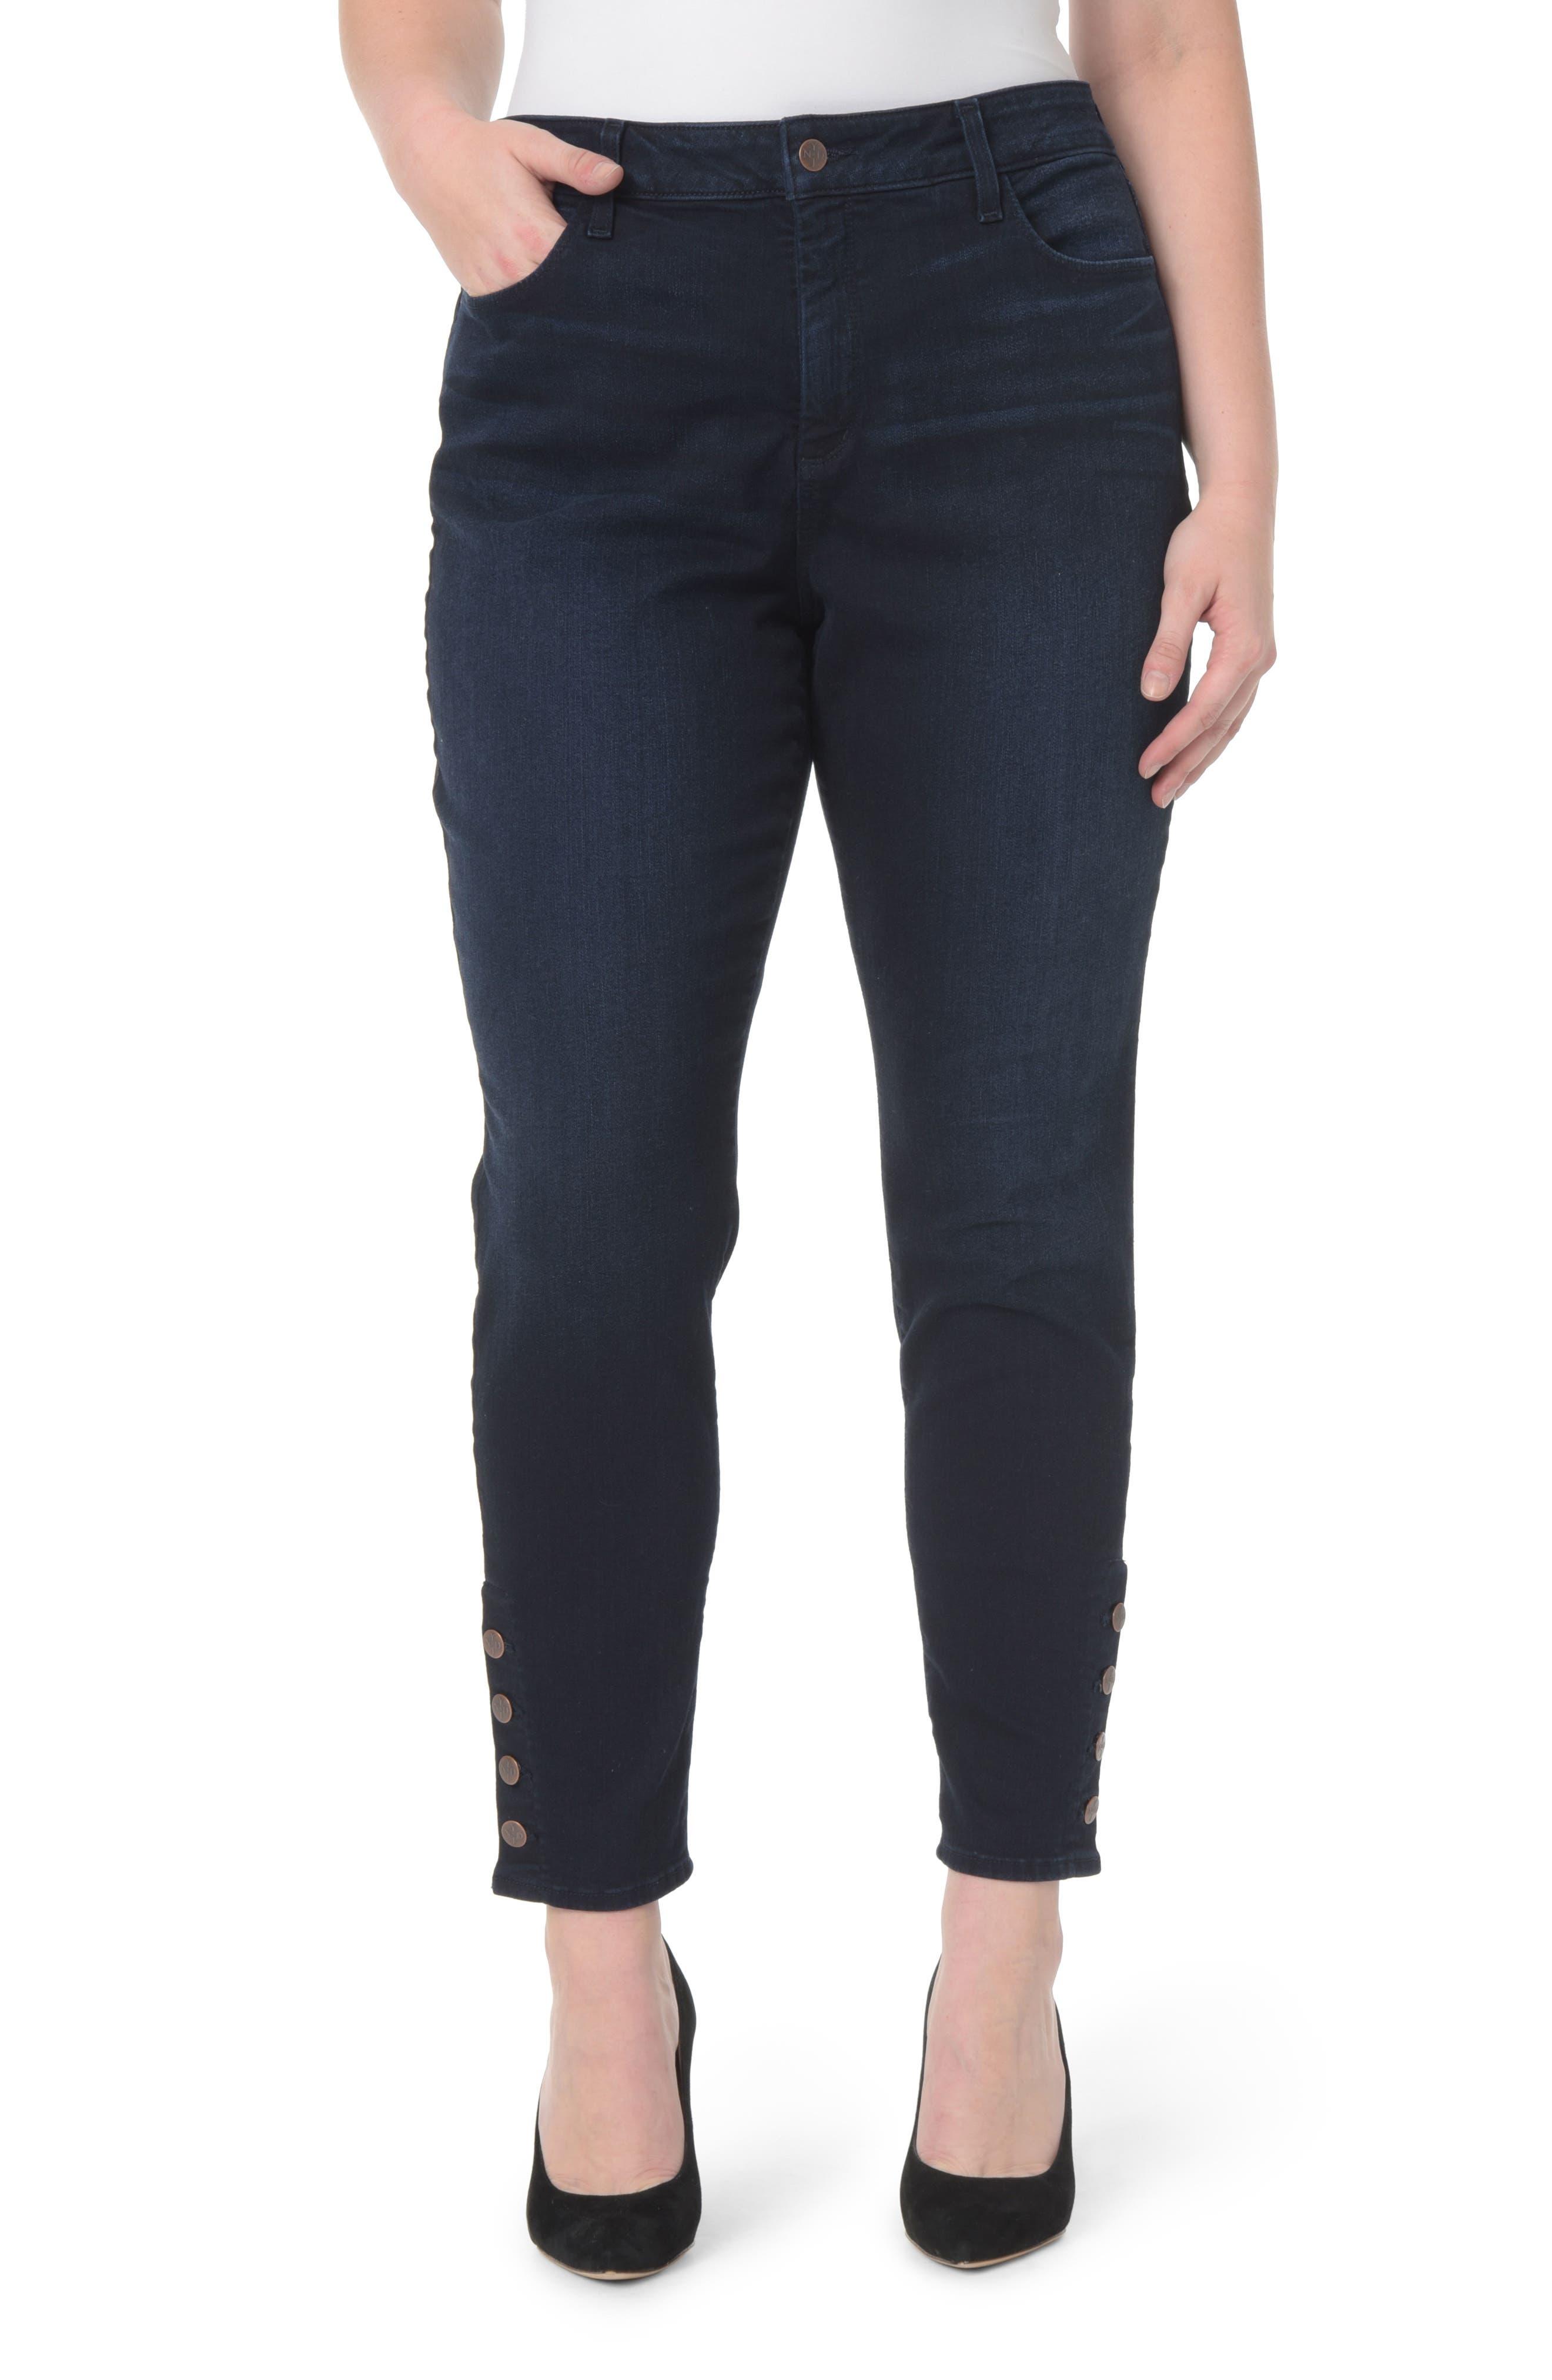 NYDJ Ami Stretch Super Skinny Jeans (Sinclair) (Plus Size)